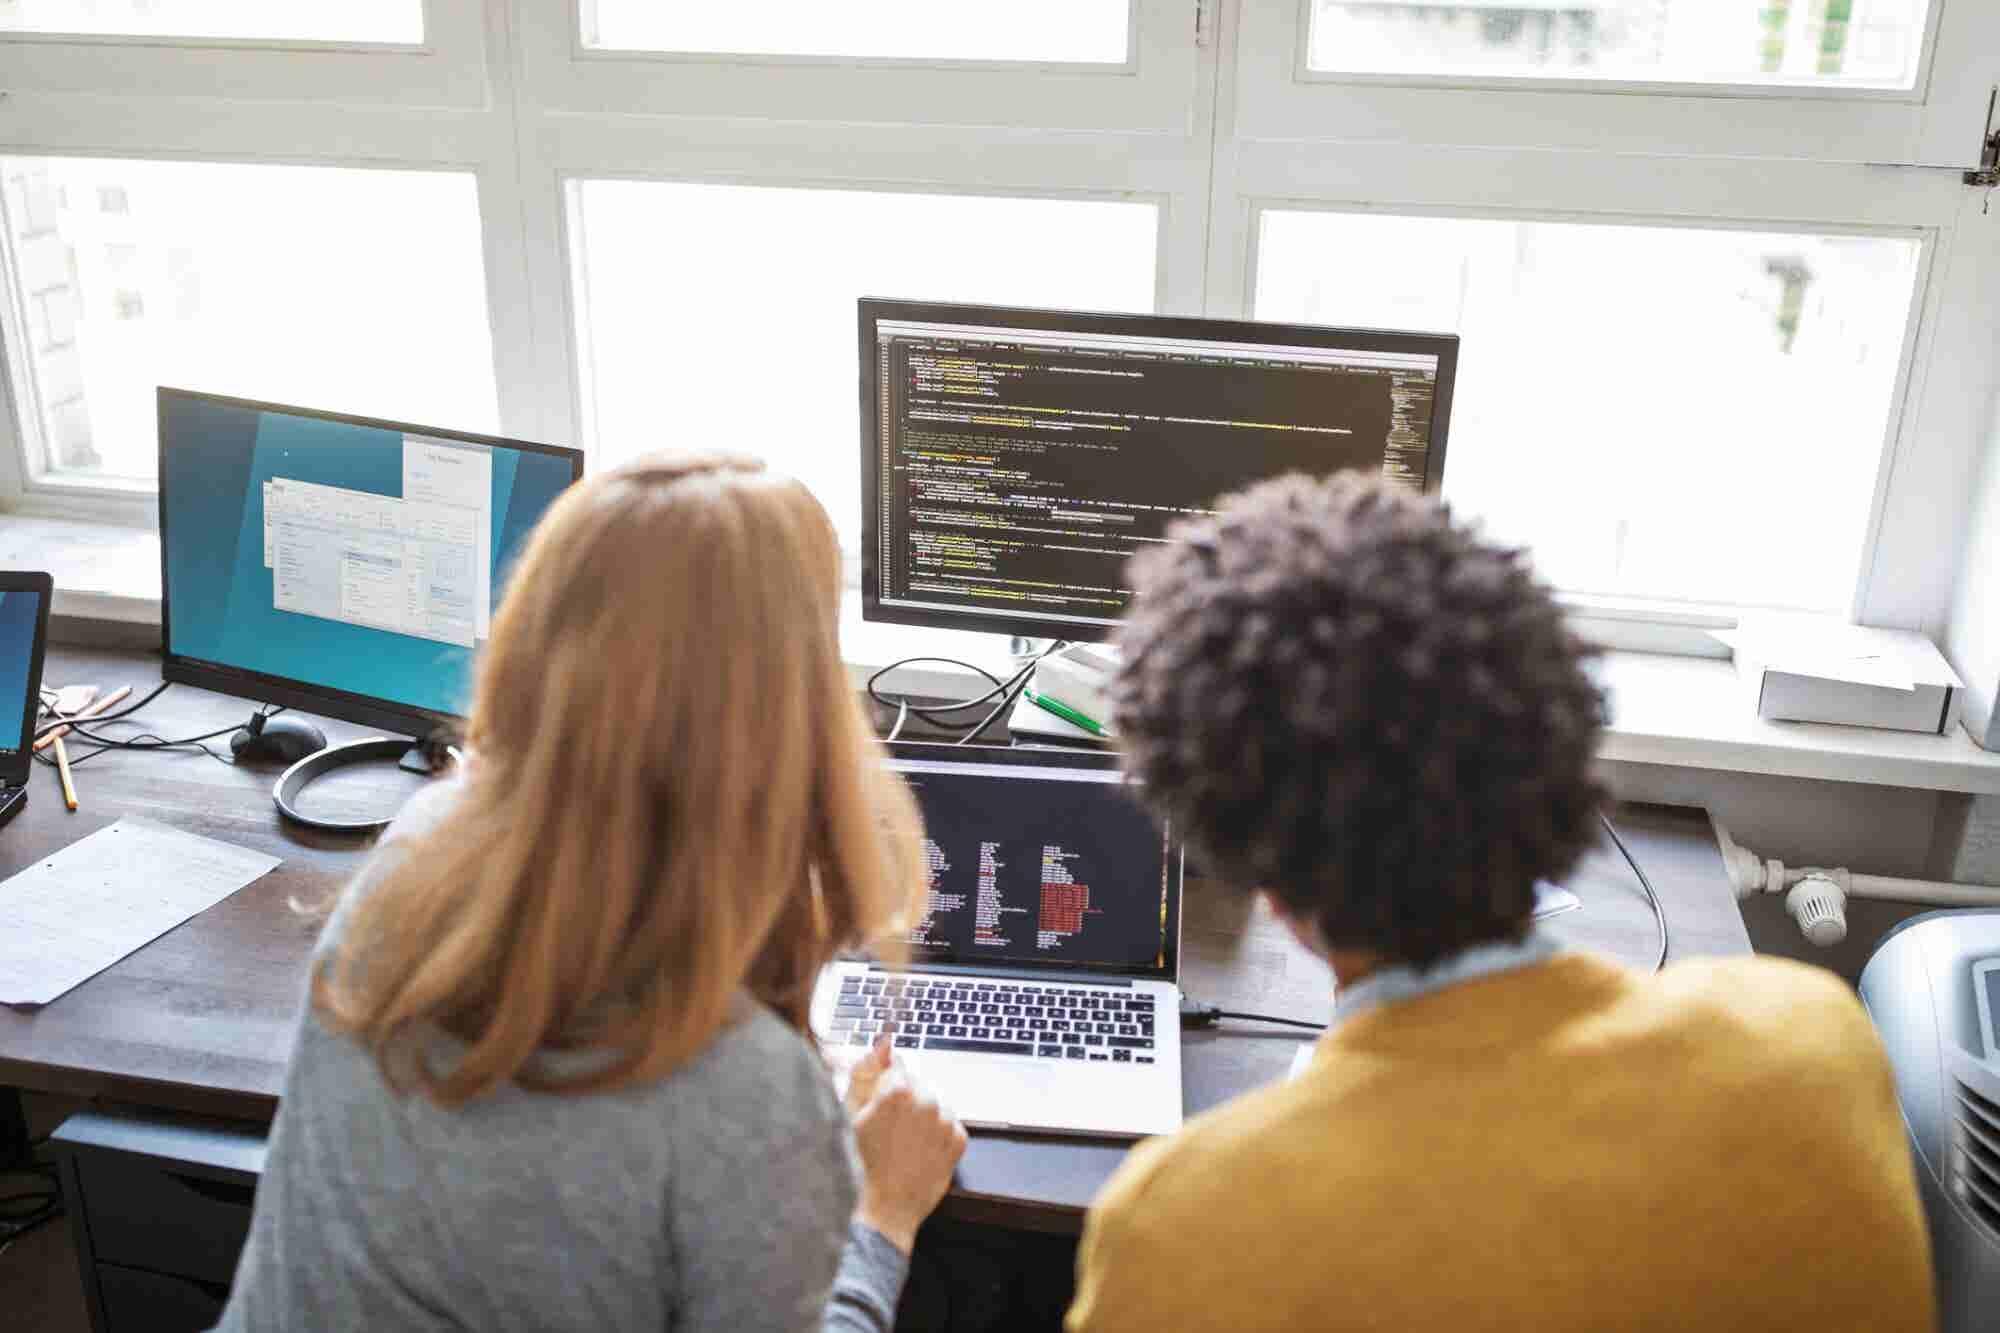 A Quick Primer on Managing Your Web-Development Tasks